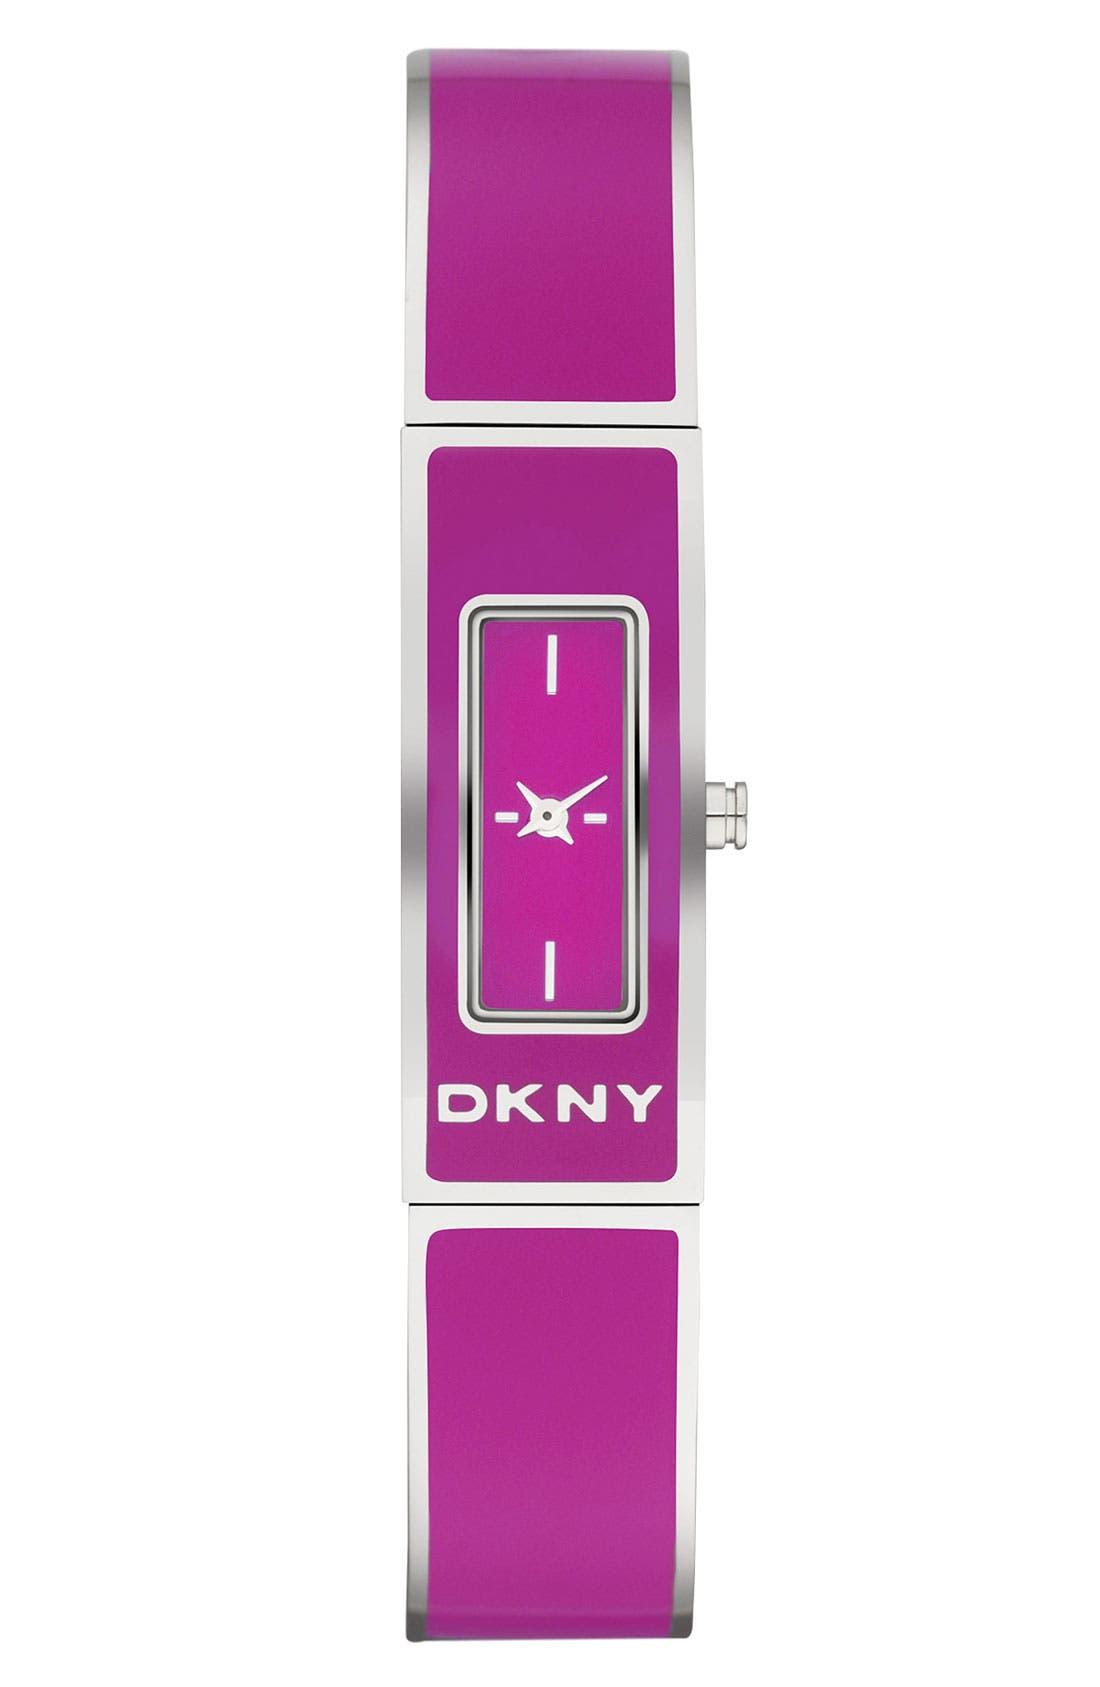 Main Image - DKNY Enamel Bangle Watch, 13mm x 33mm